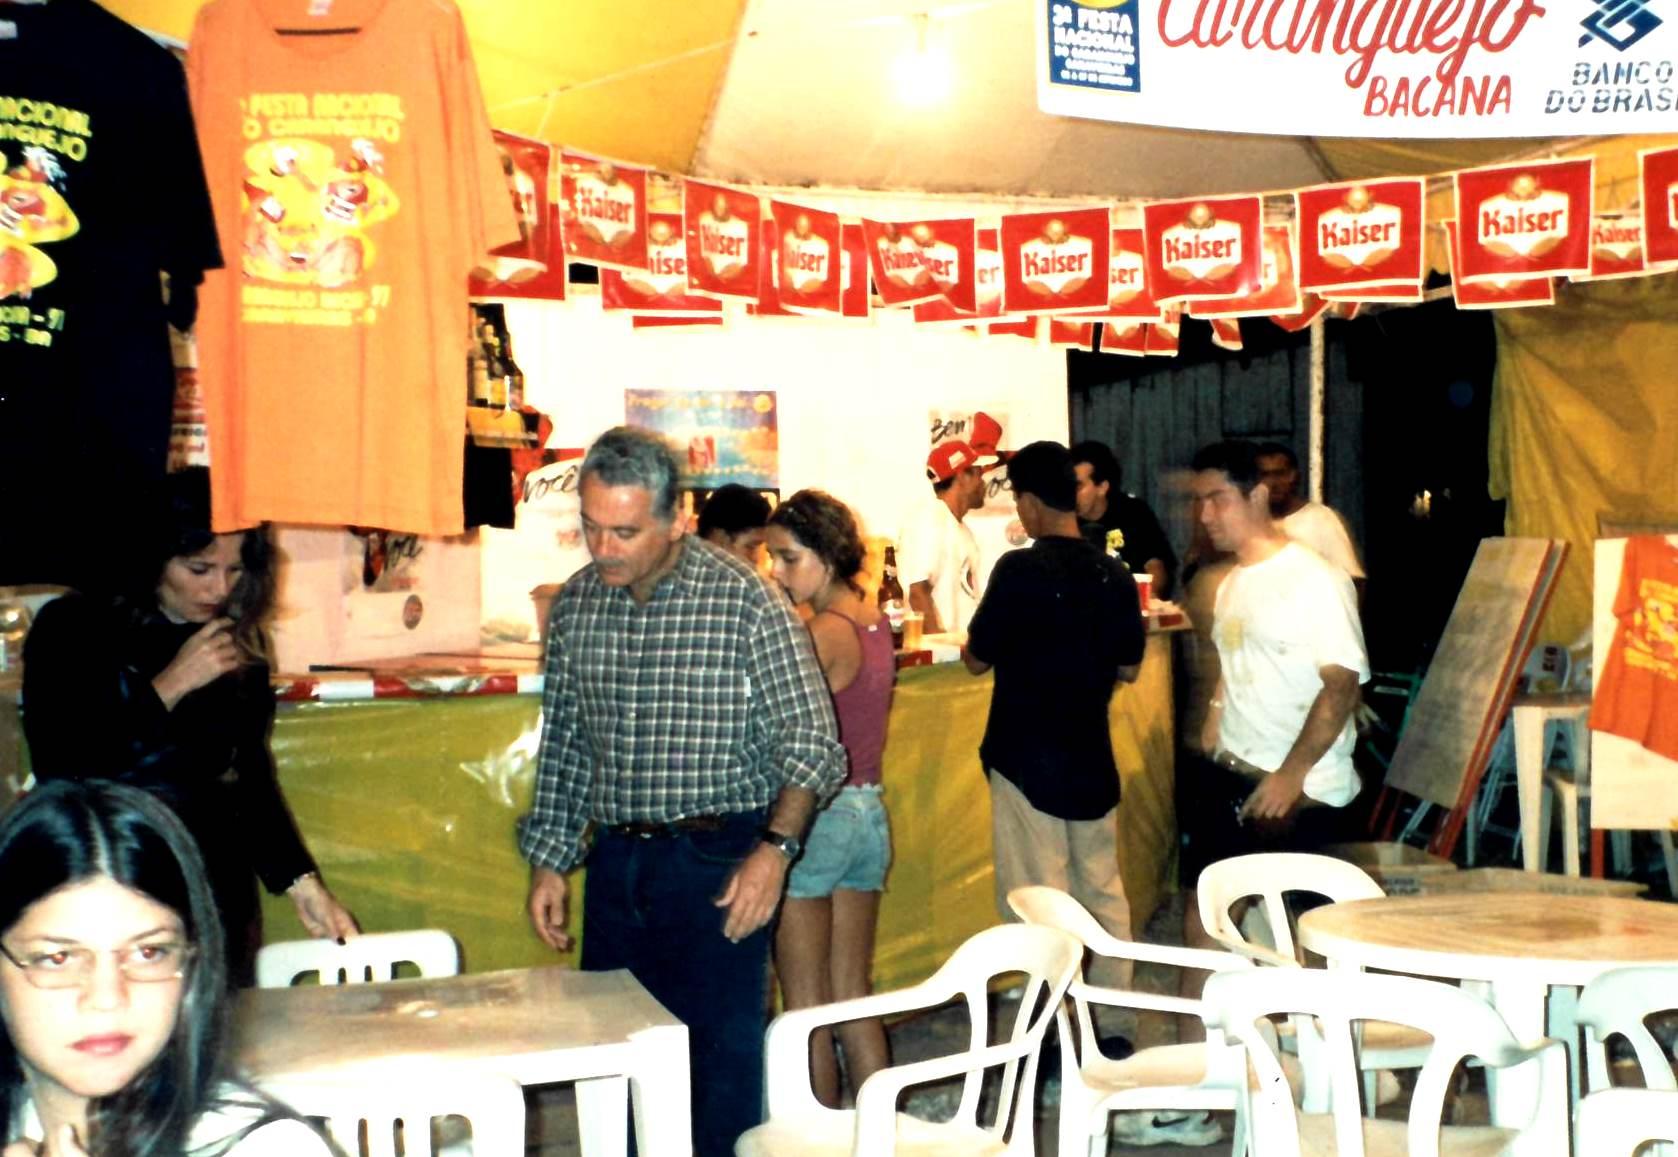 65 - Cana Bacana - FESTA NAC. CARANGUEJO